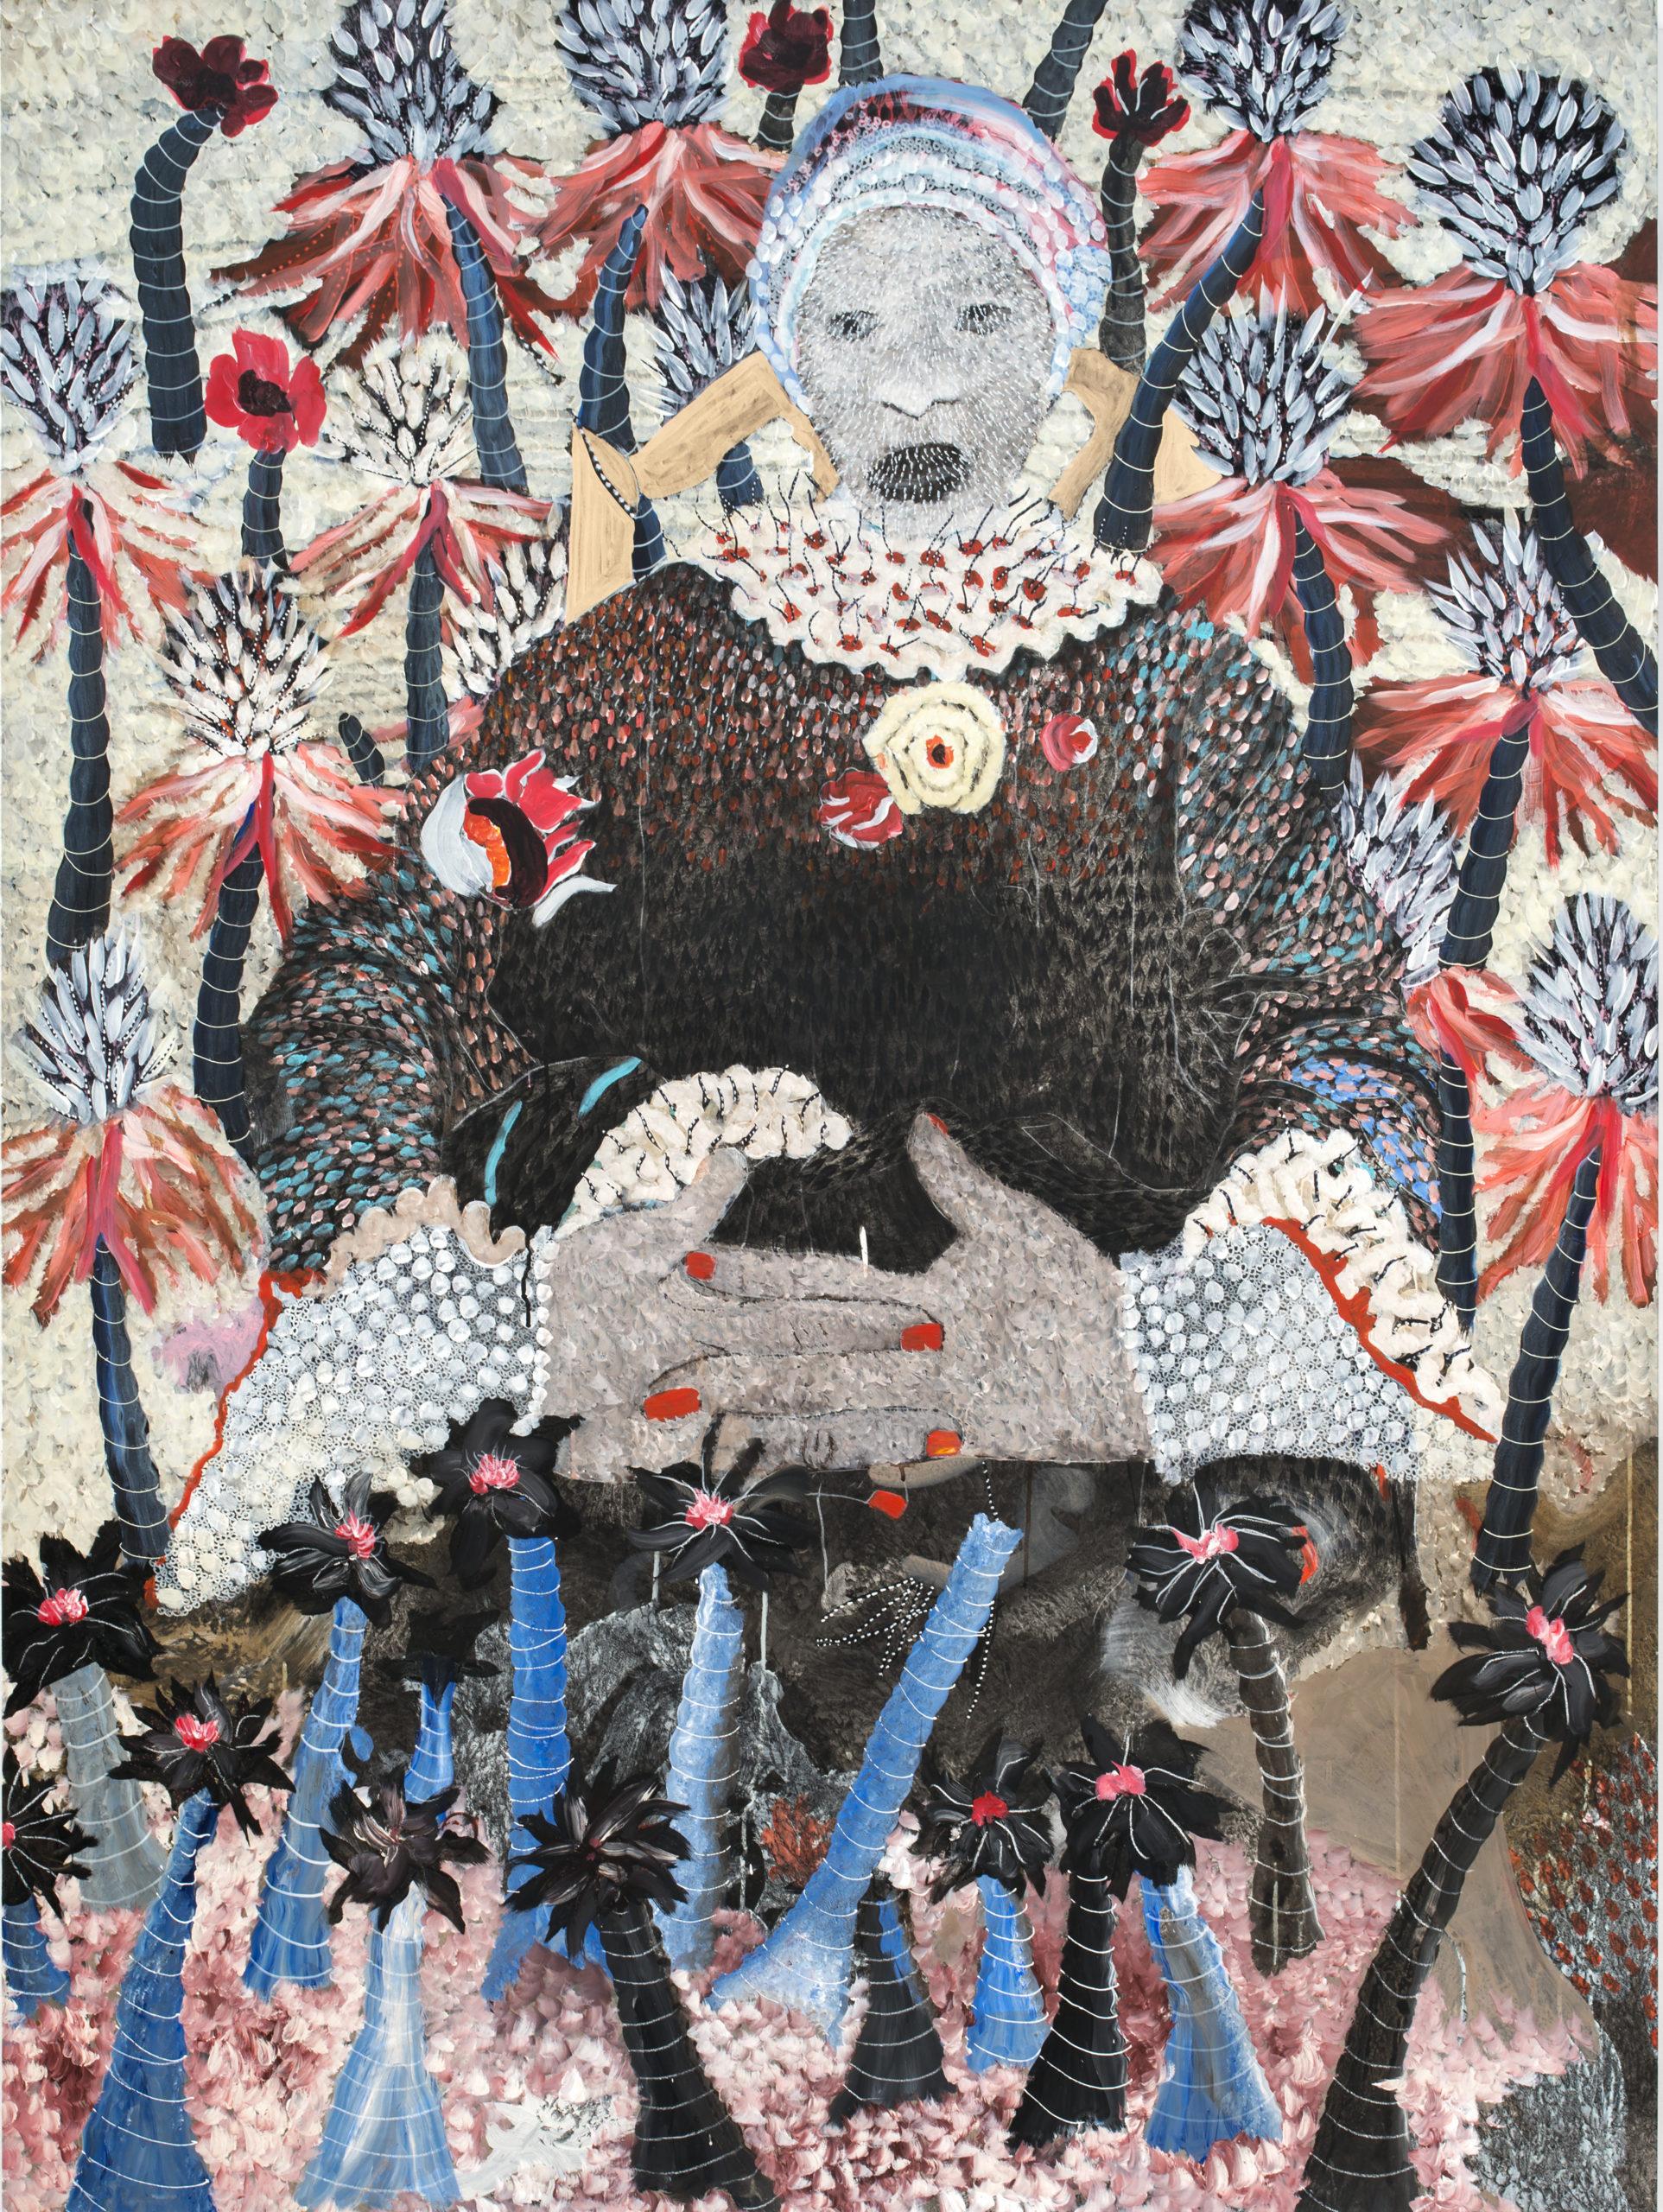 OMAR BA, I am not a toy, 2021   Acrylique, crayon, huile, encre de chine et stylo sur carton / Acrylic, pencil, oil, Indian ink and Bic pen on cardboard 250 x 150 cm – 98 3/7 x 59 1/16 in.